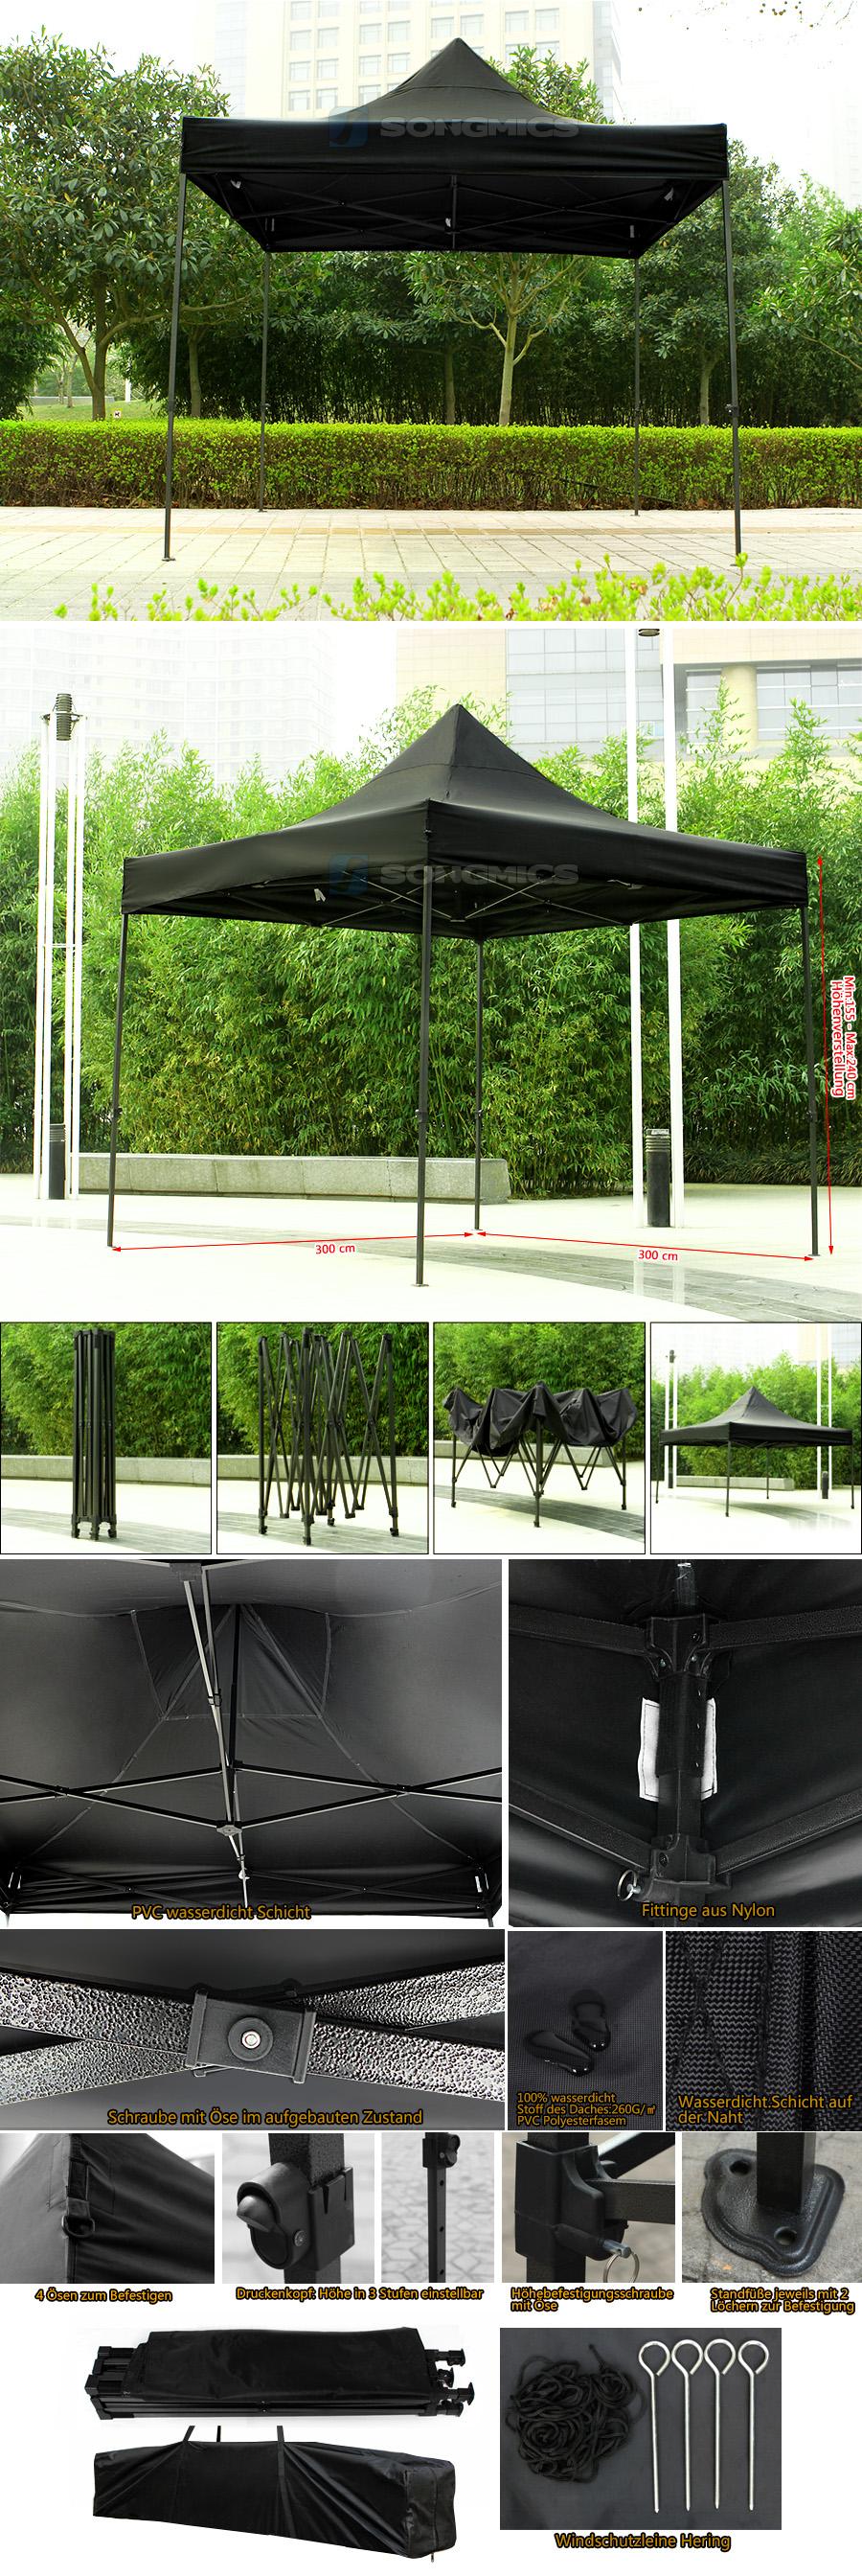 songmics faltpavillon partyzelt pavillon faltzelt gartenzelt 3x3 meter festzelt. Black Bedroom Furniture Sets. Home Design Ideas